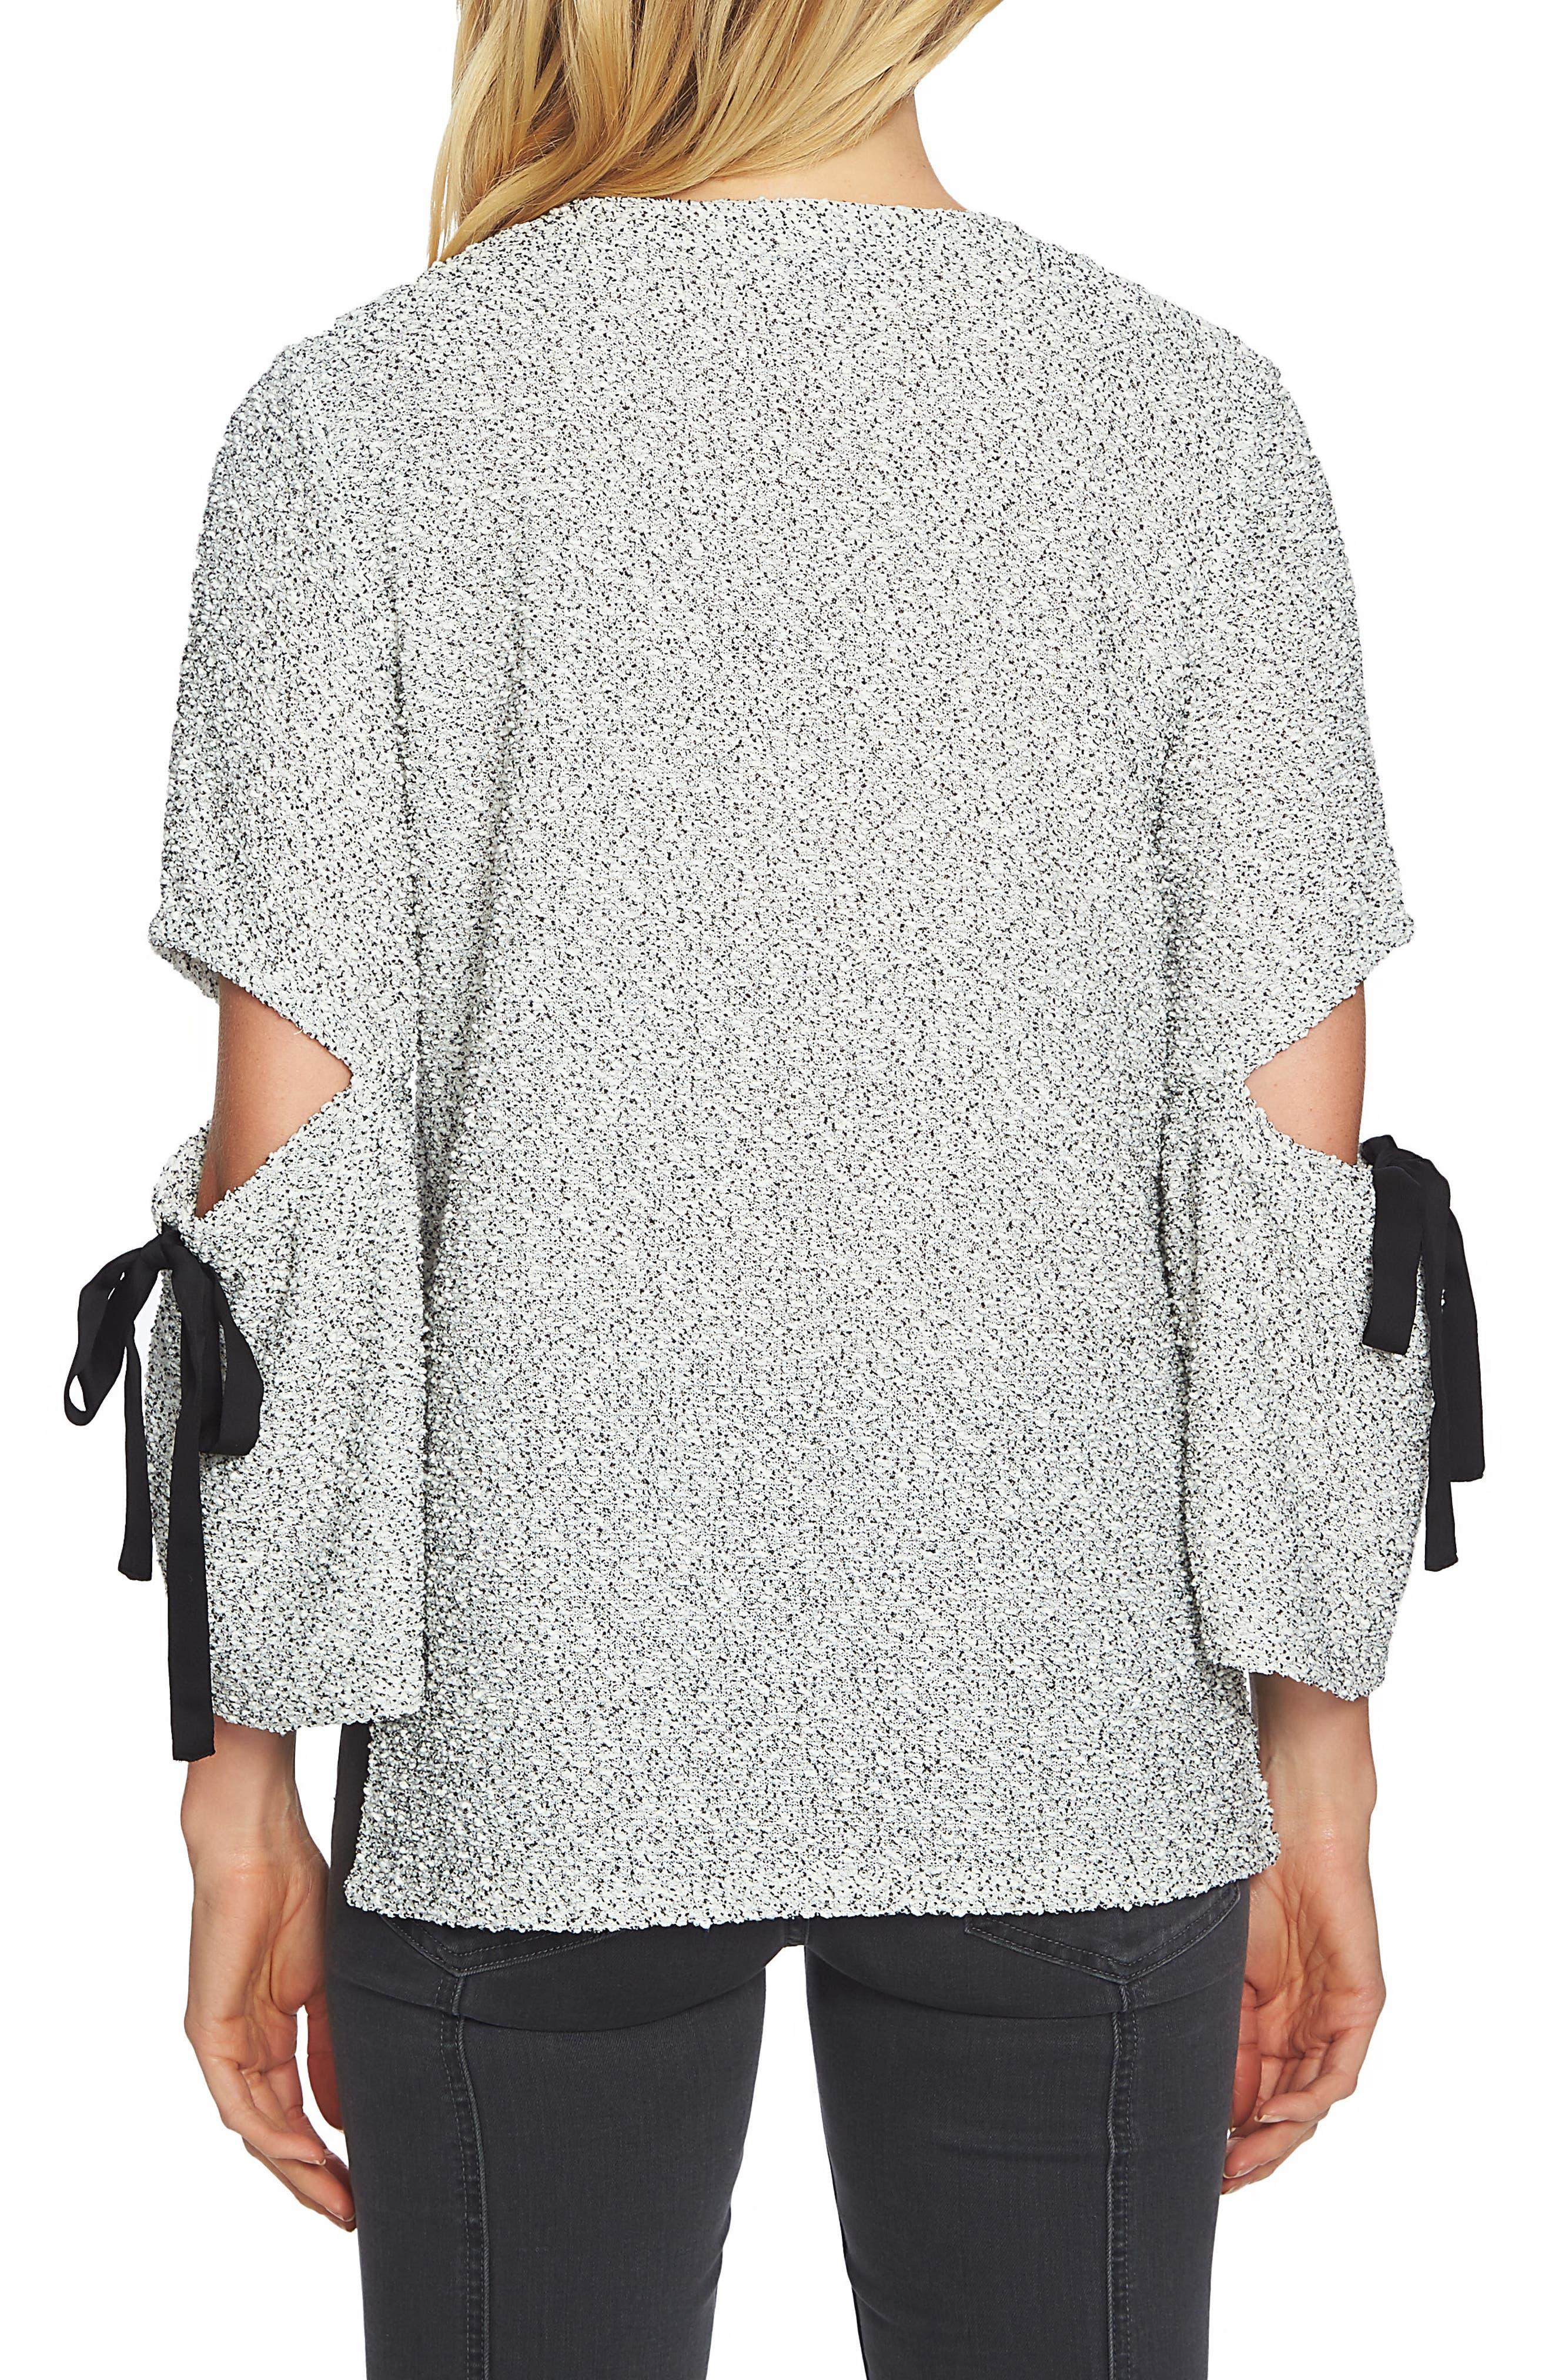 Cutout Tie Sleeve Sweater,                             Alternate thumbnail 2, color,                             125-Light Cream